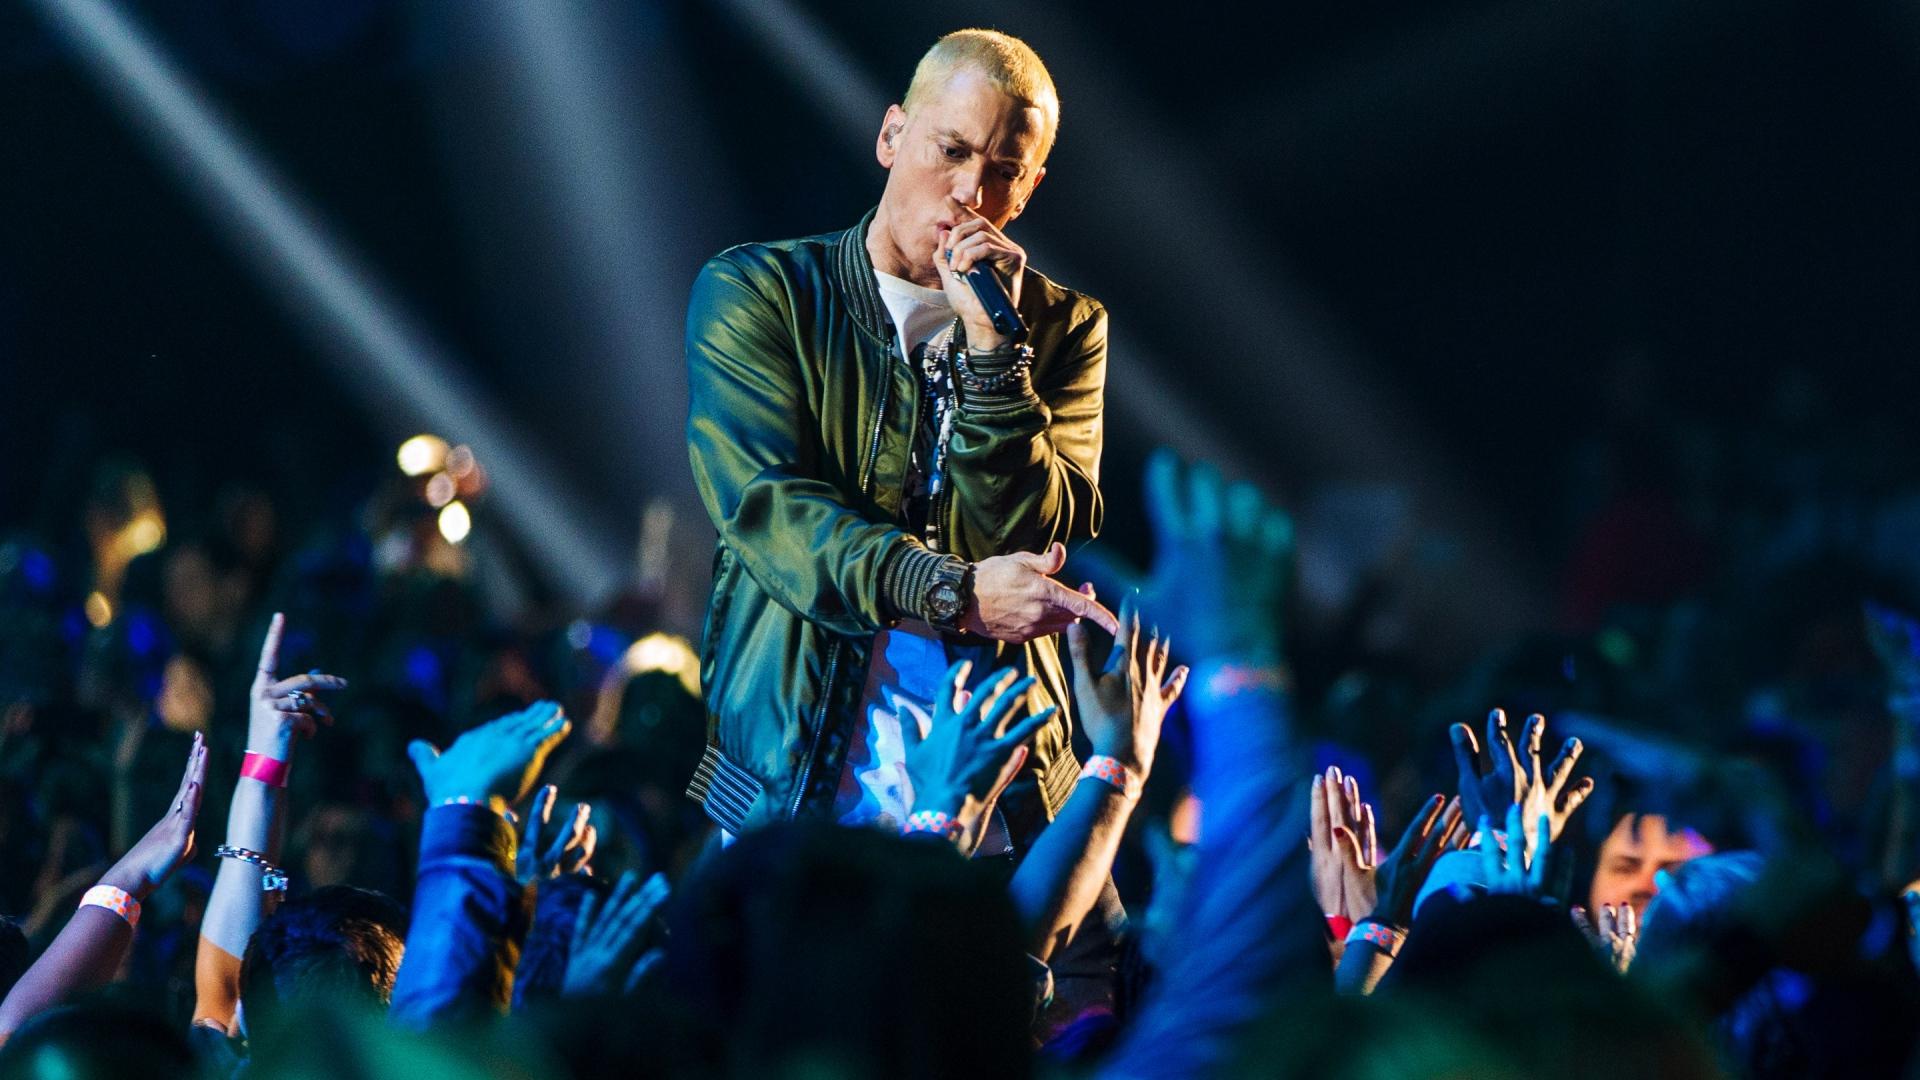 Fall Out Boy Wallpaper Hd Eminem Singer Wallpaper Pixelstalk Net